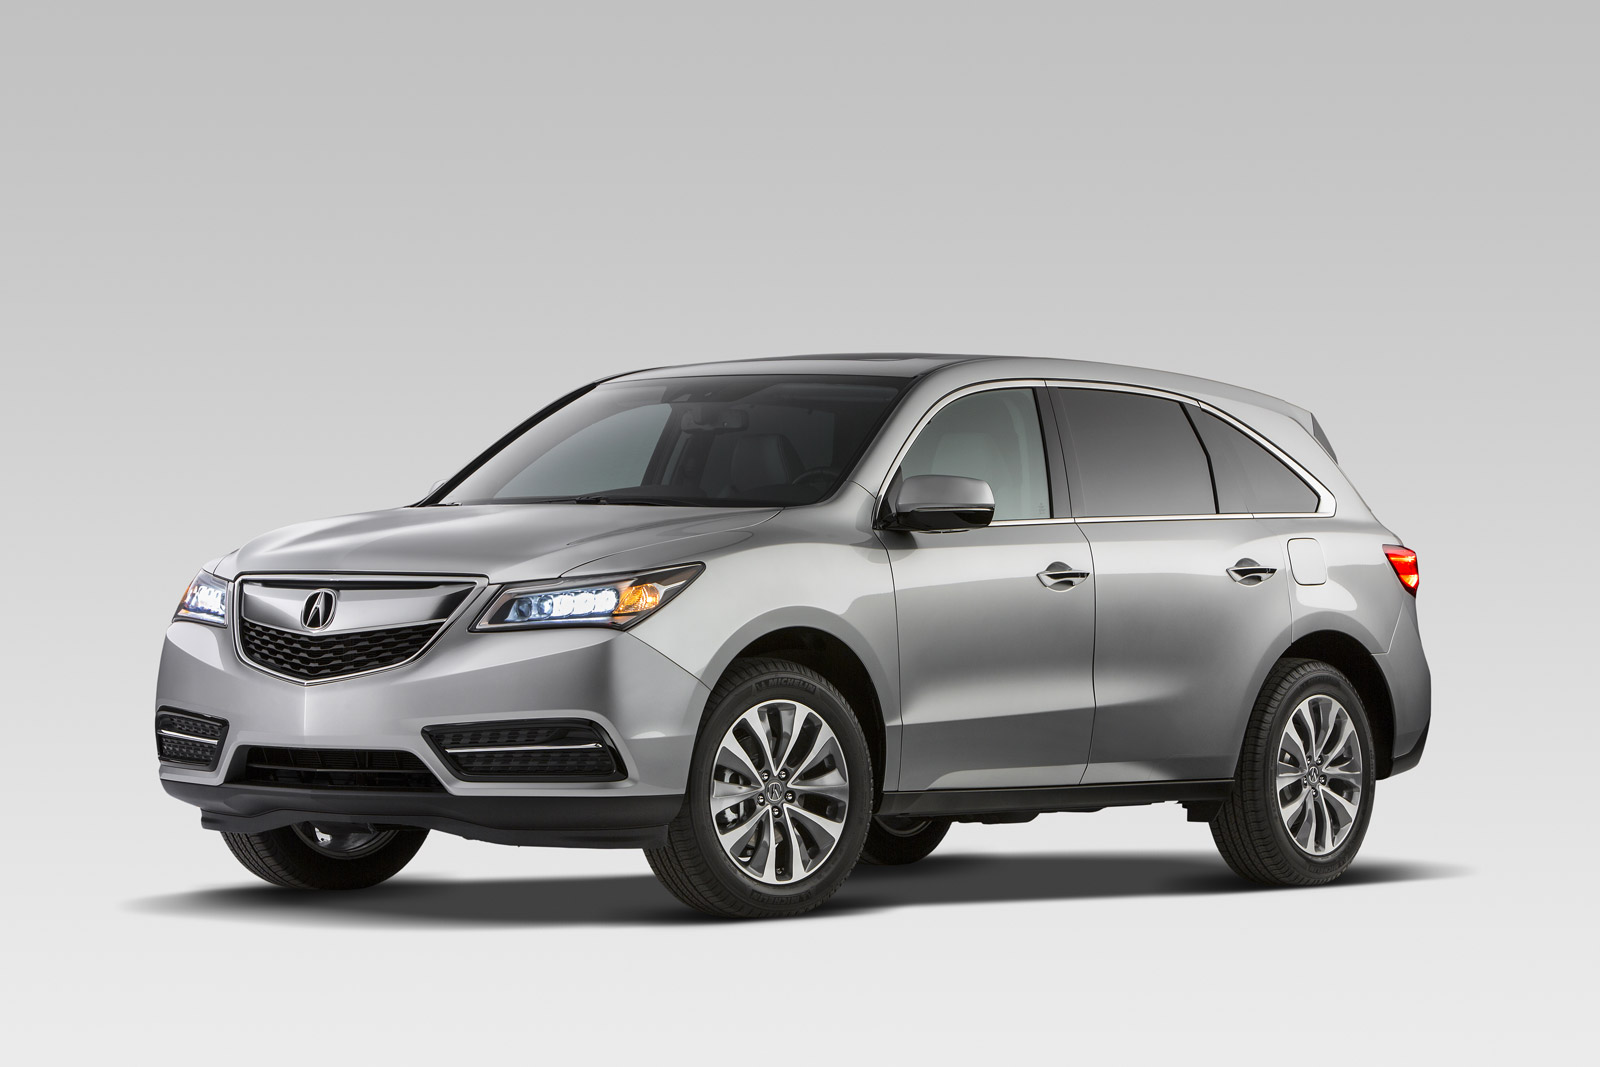 2015 Acura MDX Sees Slight Price Increase